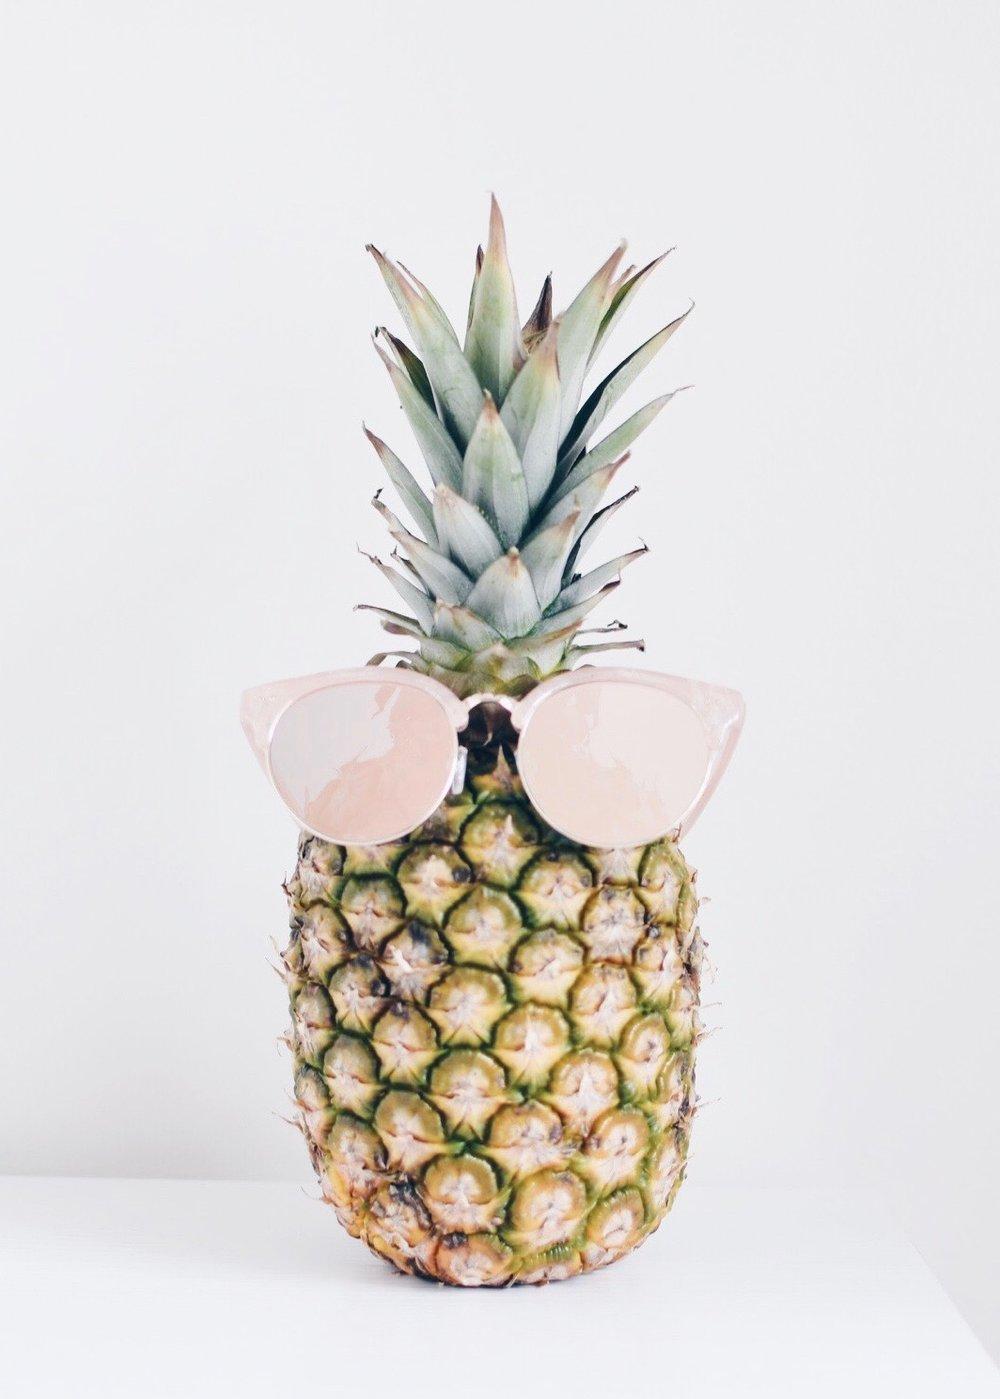 Cute Sunglasses for Summer